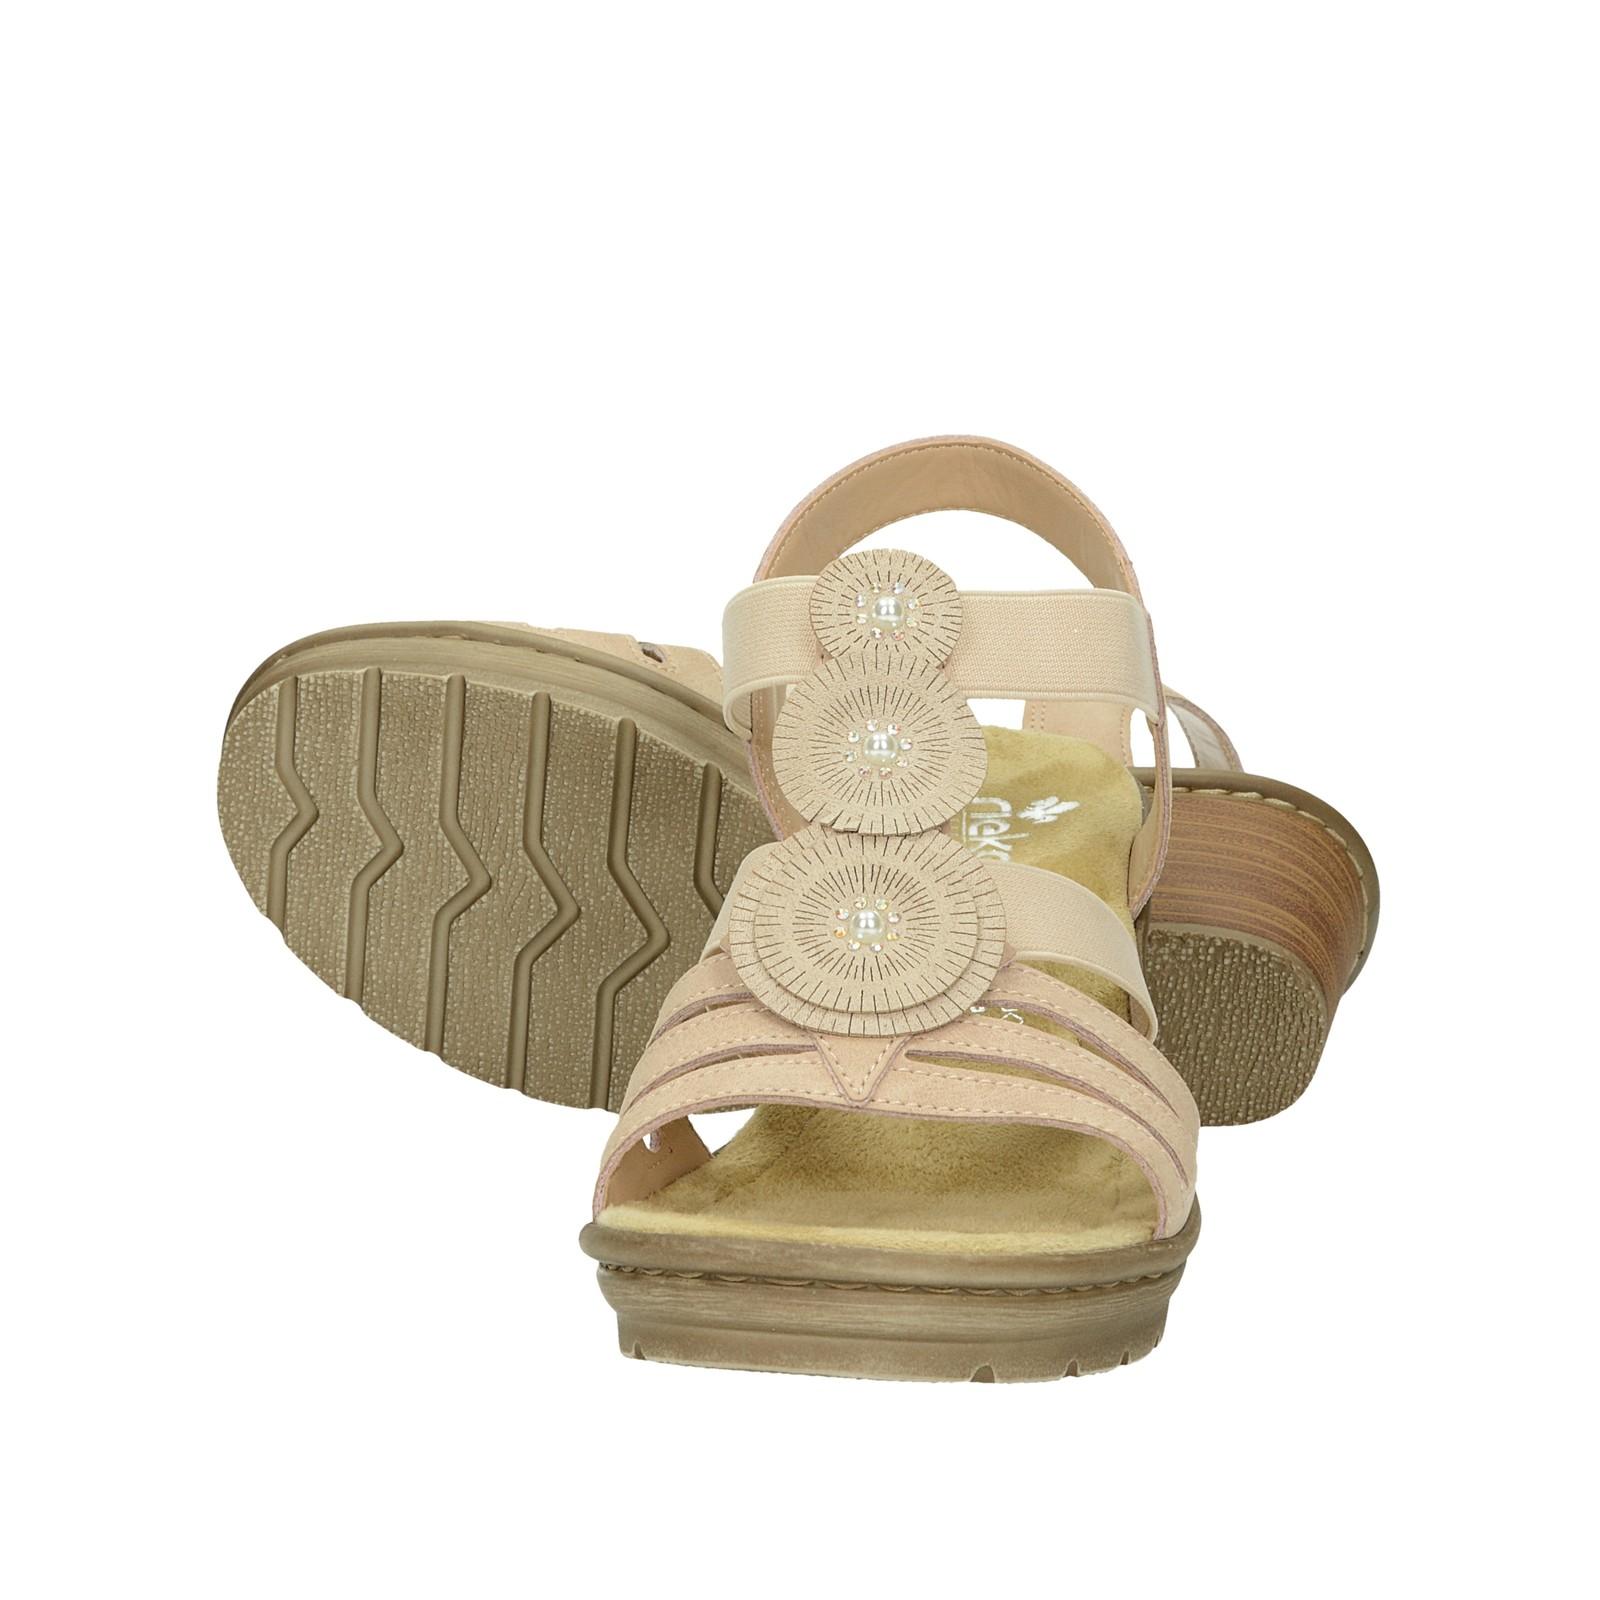 Rieker dámske štýlové sandále na podpätku - ružové